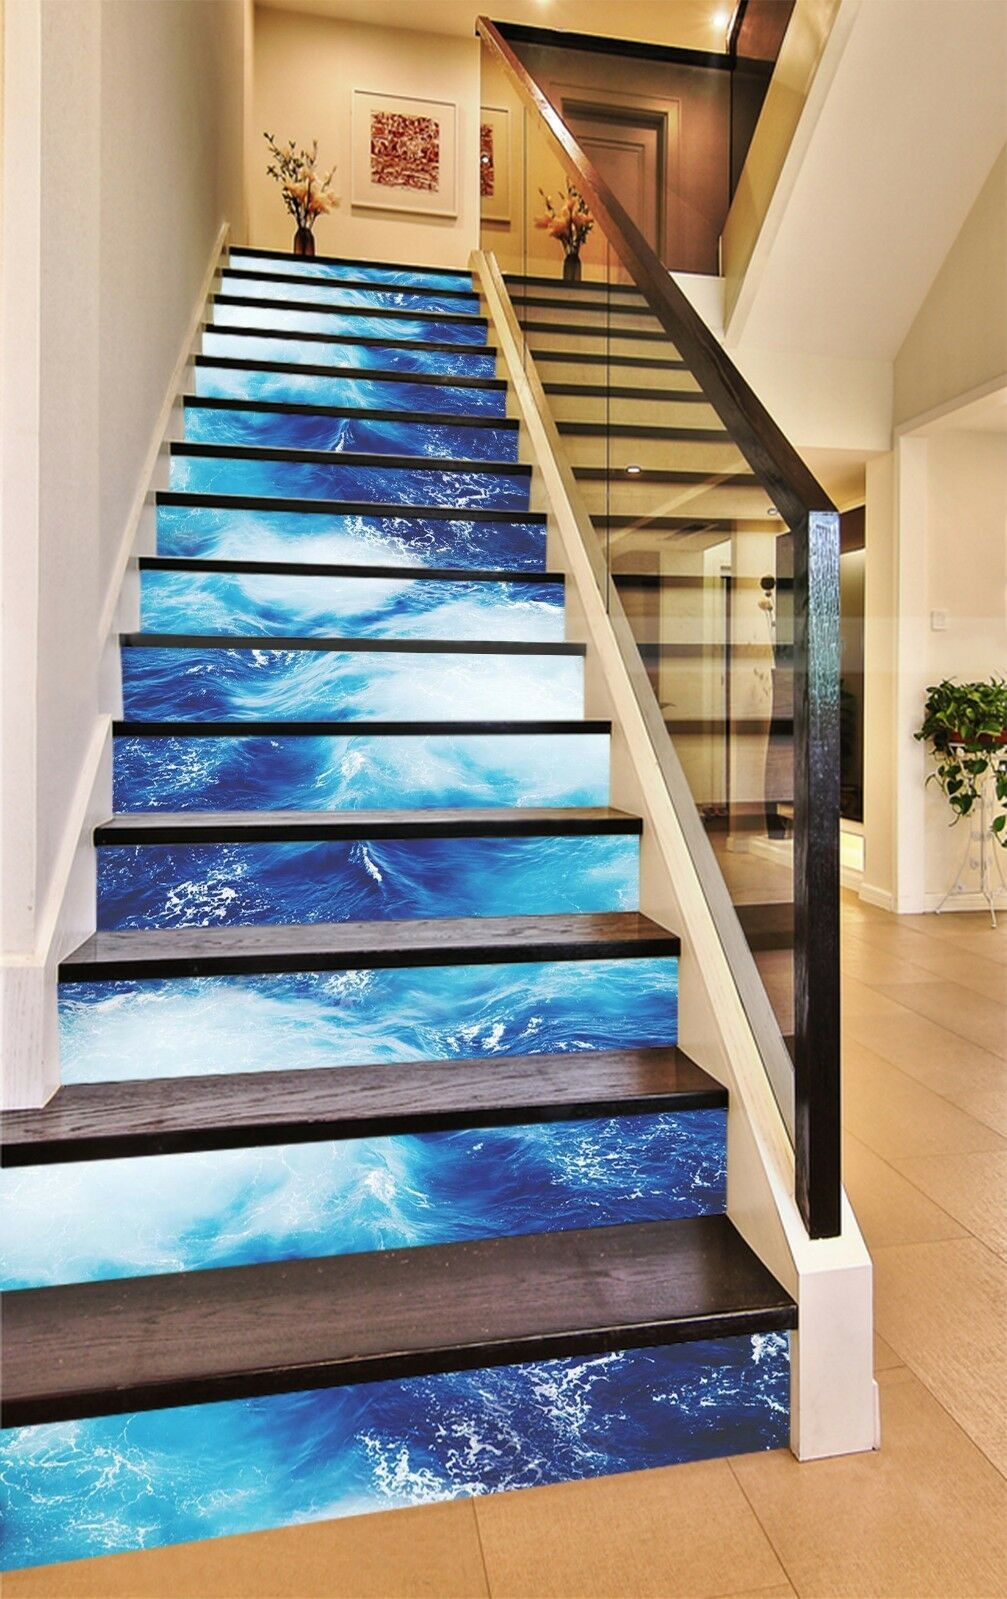 3D Bule Sea Pattern Stair Risers Decoration Photo Mural Vinyl Decal WandPapier UK